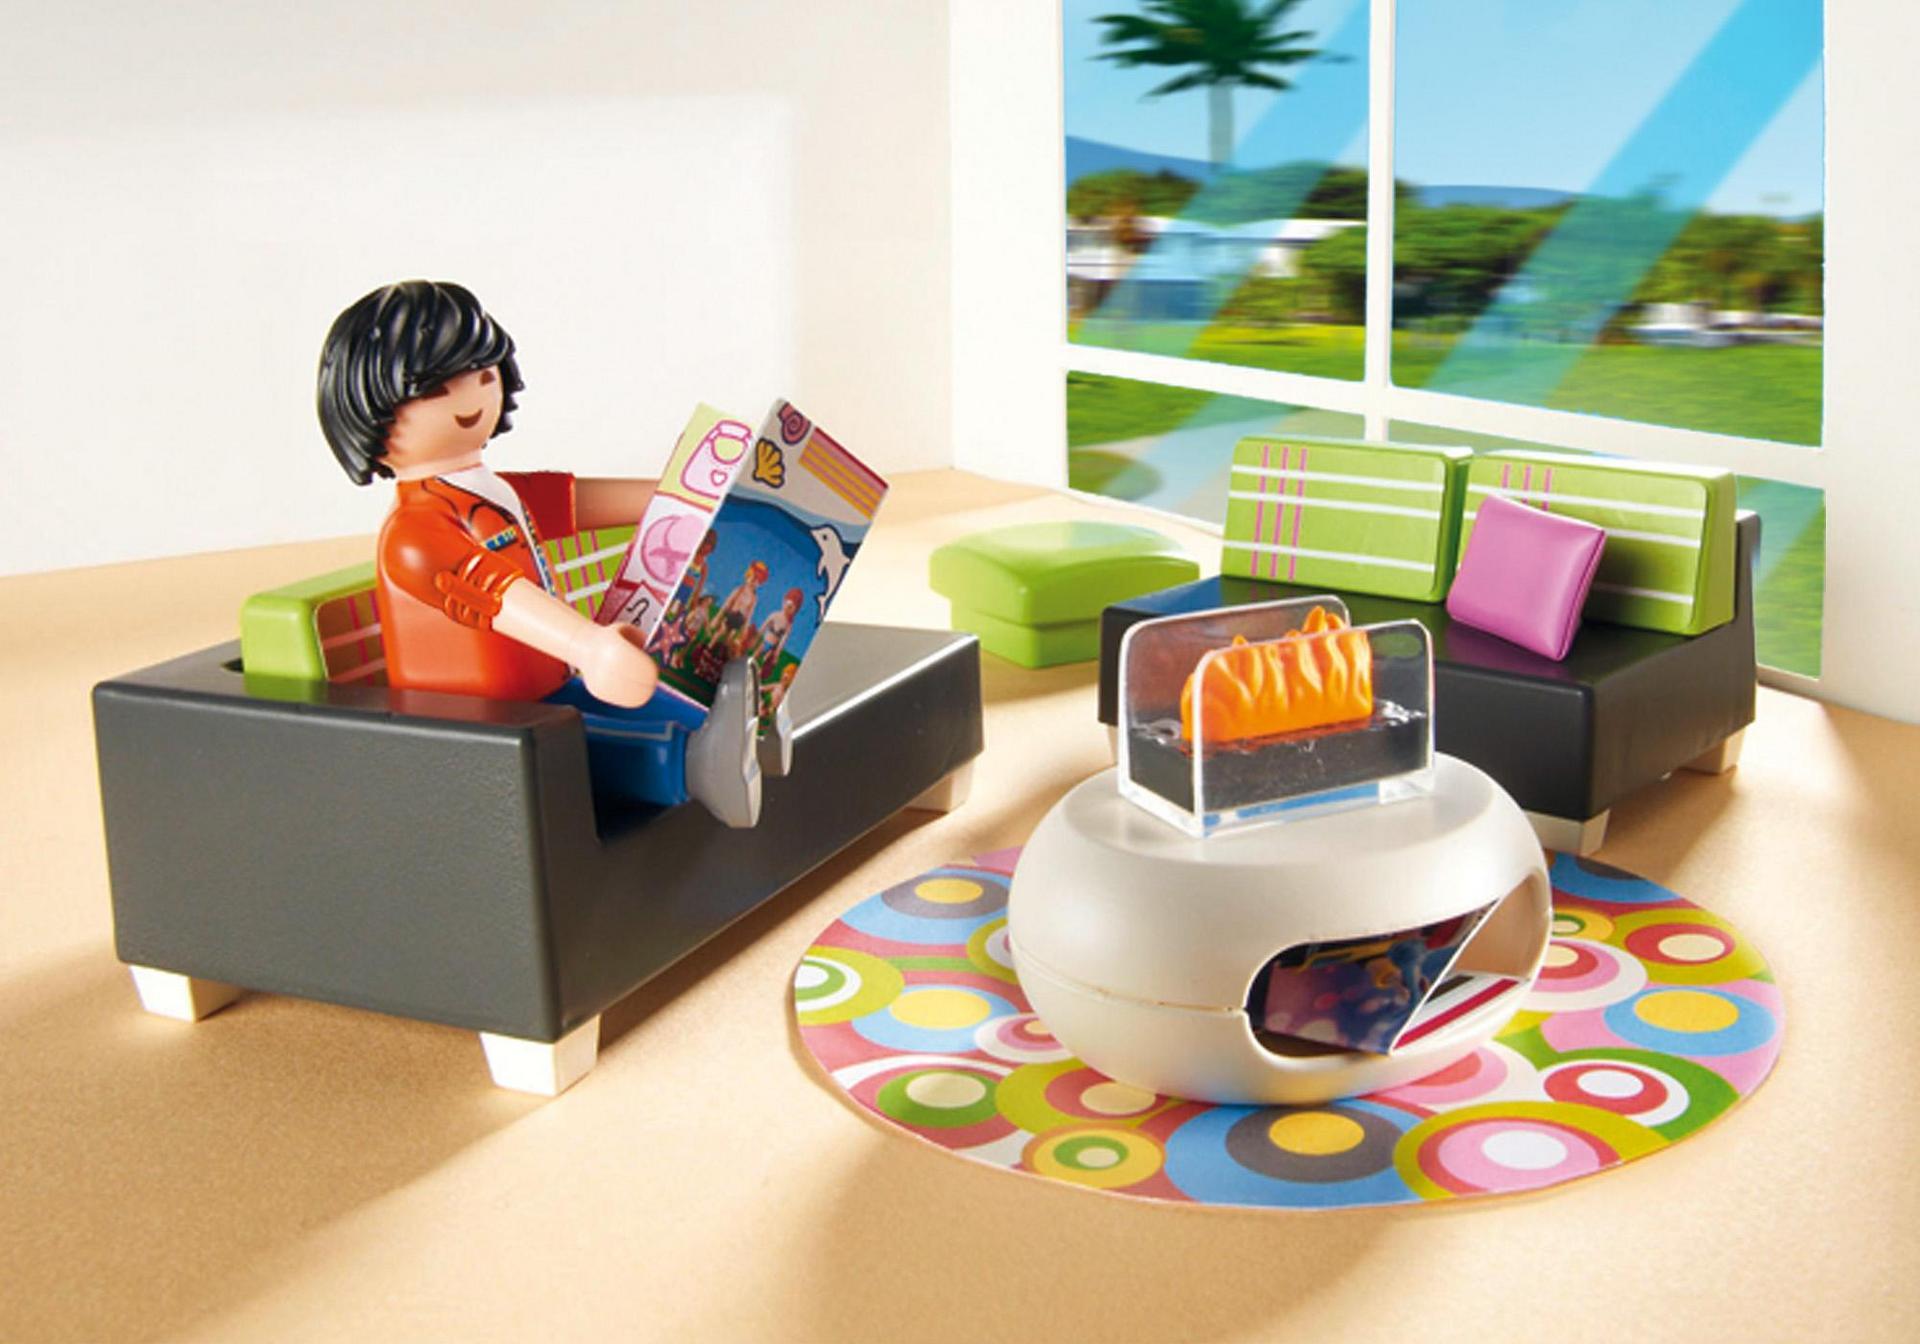 Salon moderne 5584 playmobil france for Salon playmobil